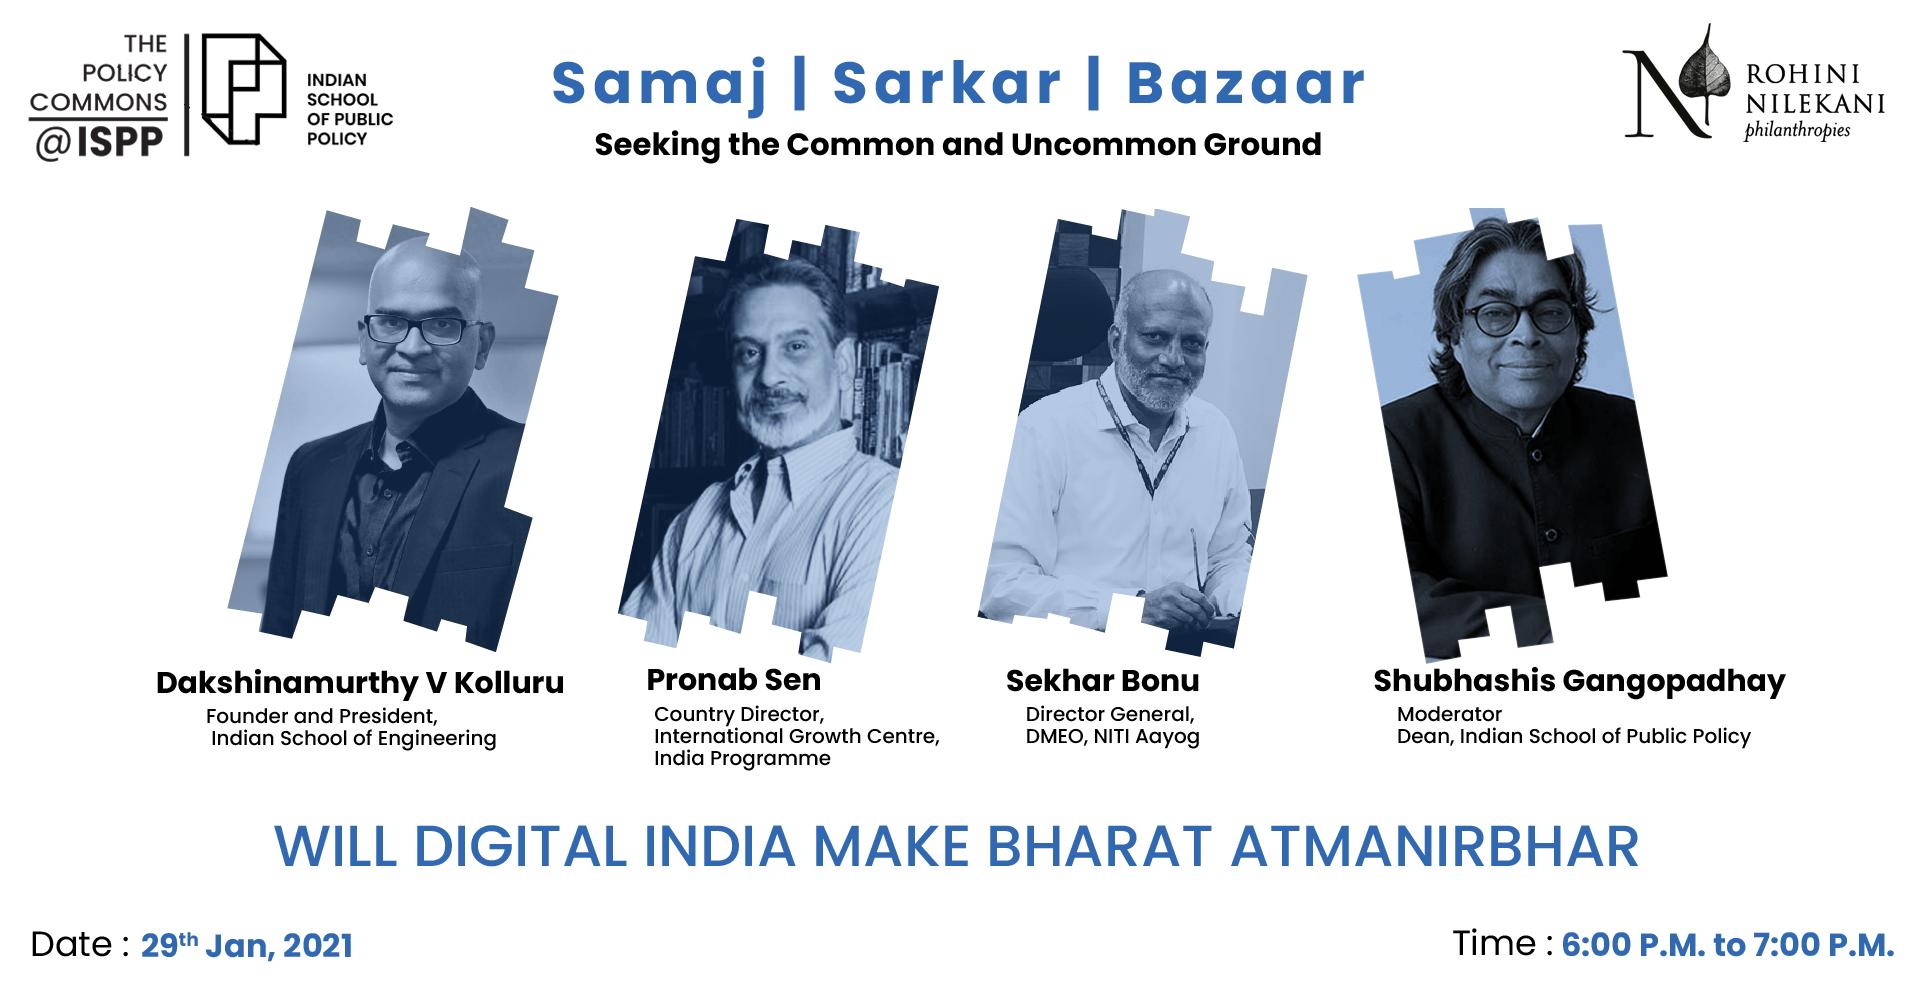 WILL DIGITAL INDIA MAKE BHARAT ATMANIRBHAR